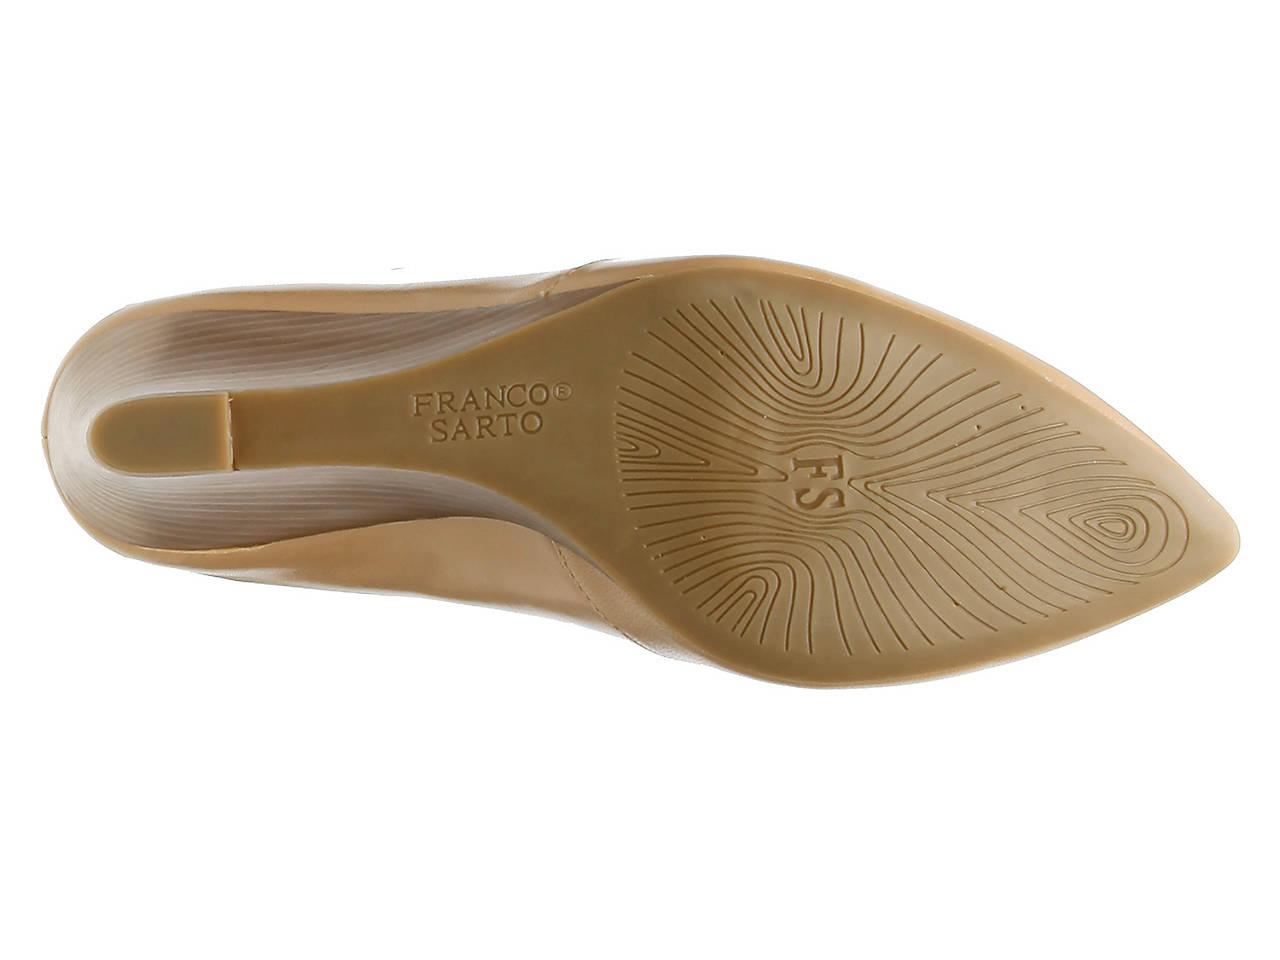 2c2a4e0524d Franco Sarto Frankie Wedge Pump Women s Shoes